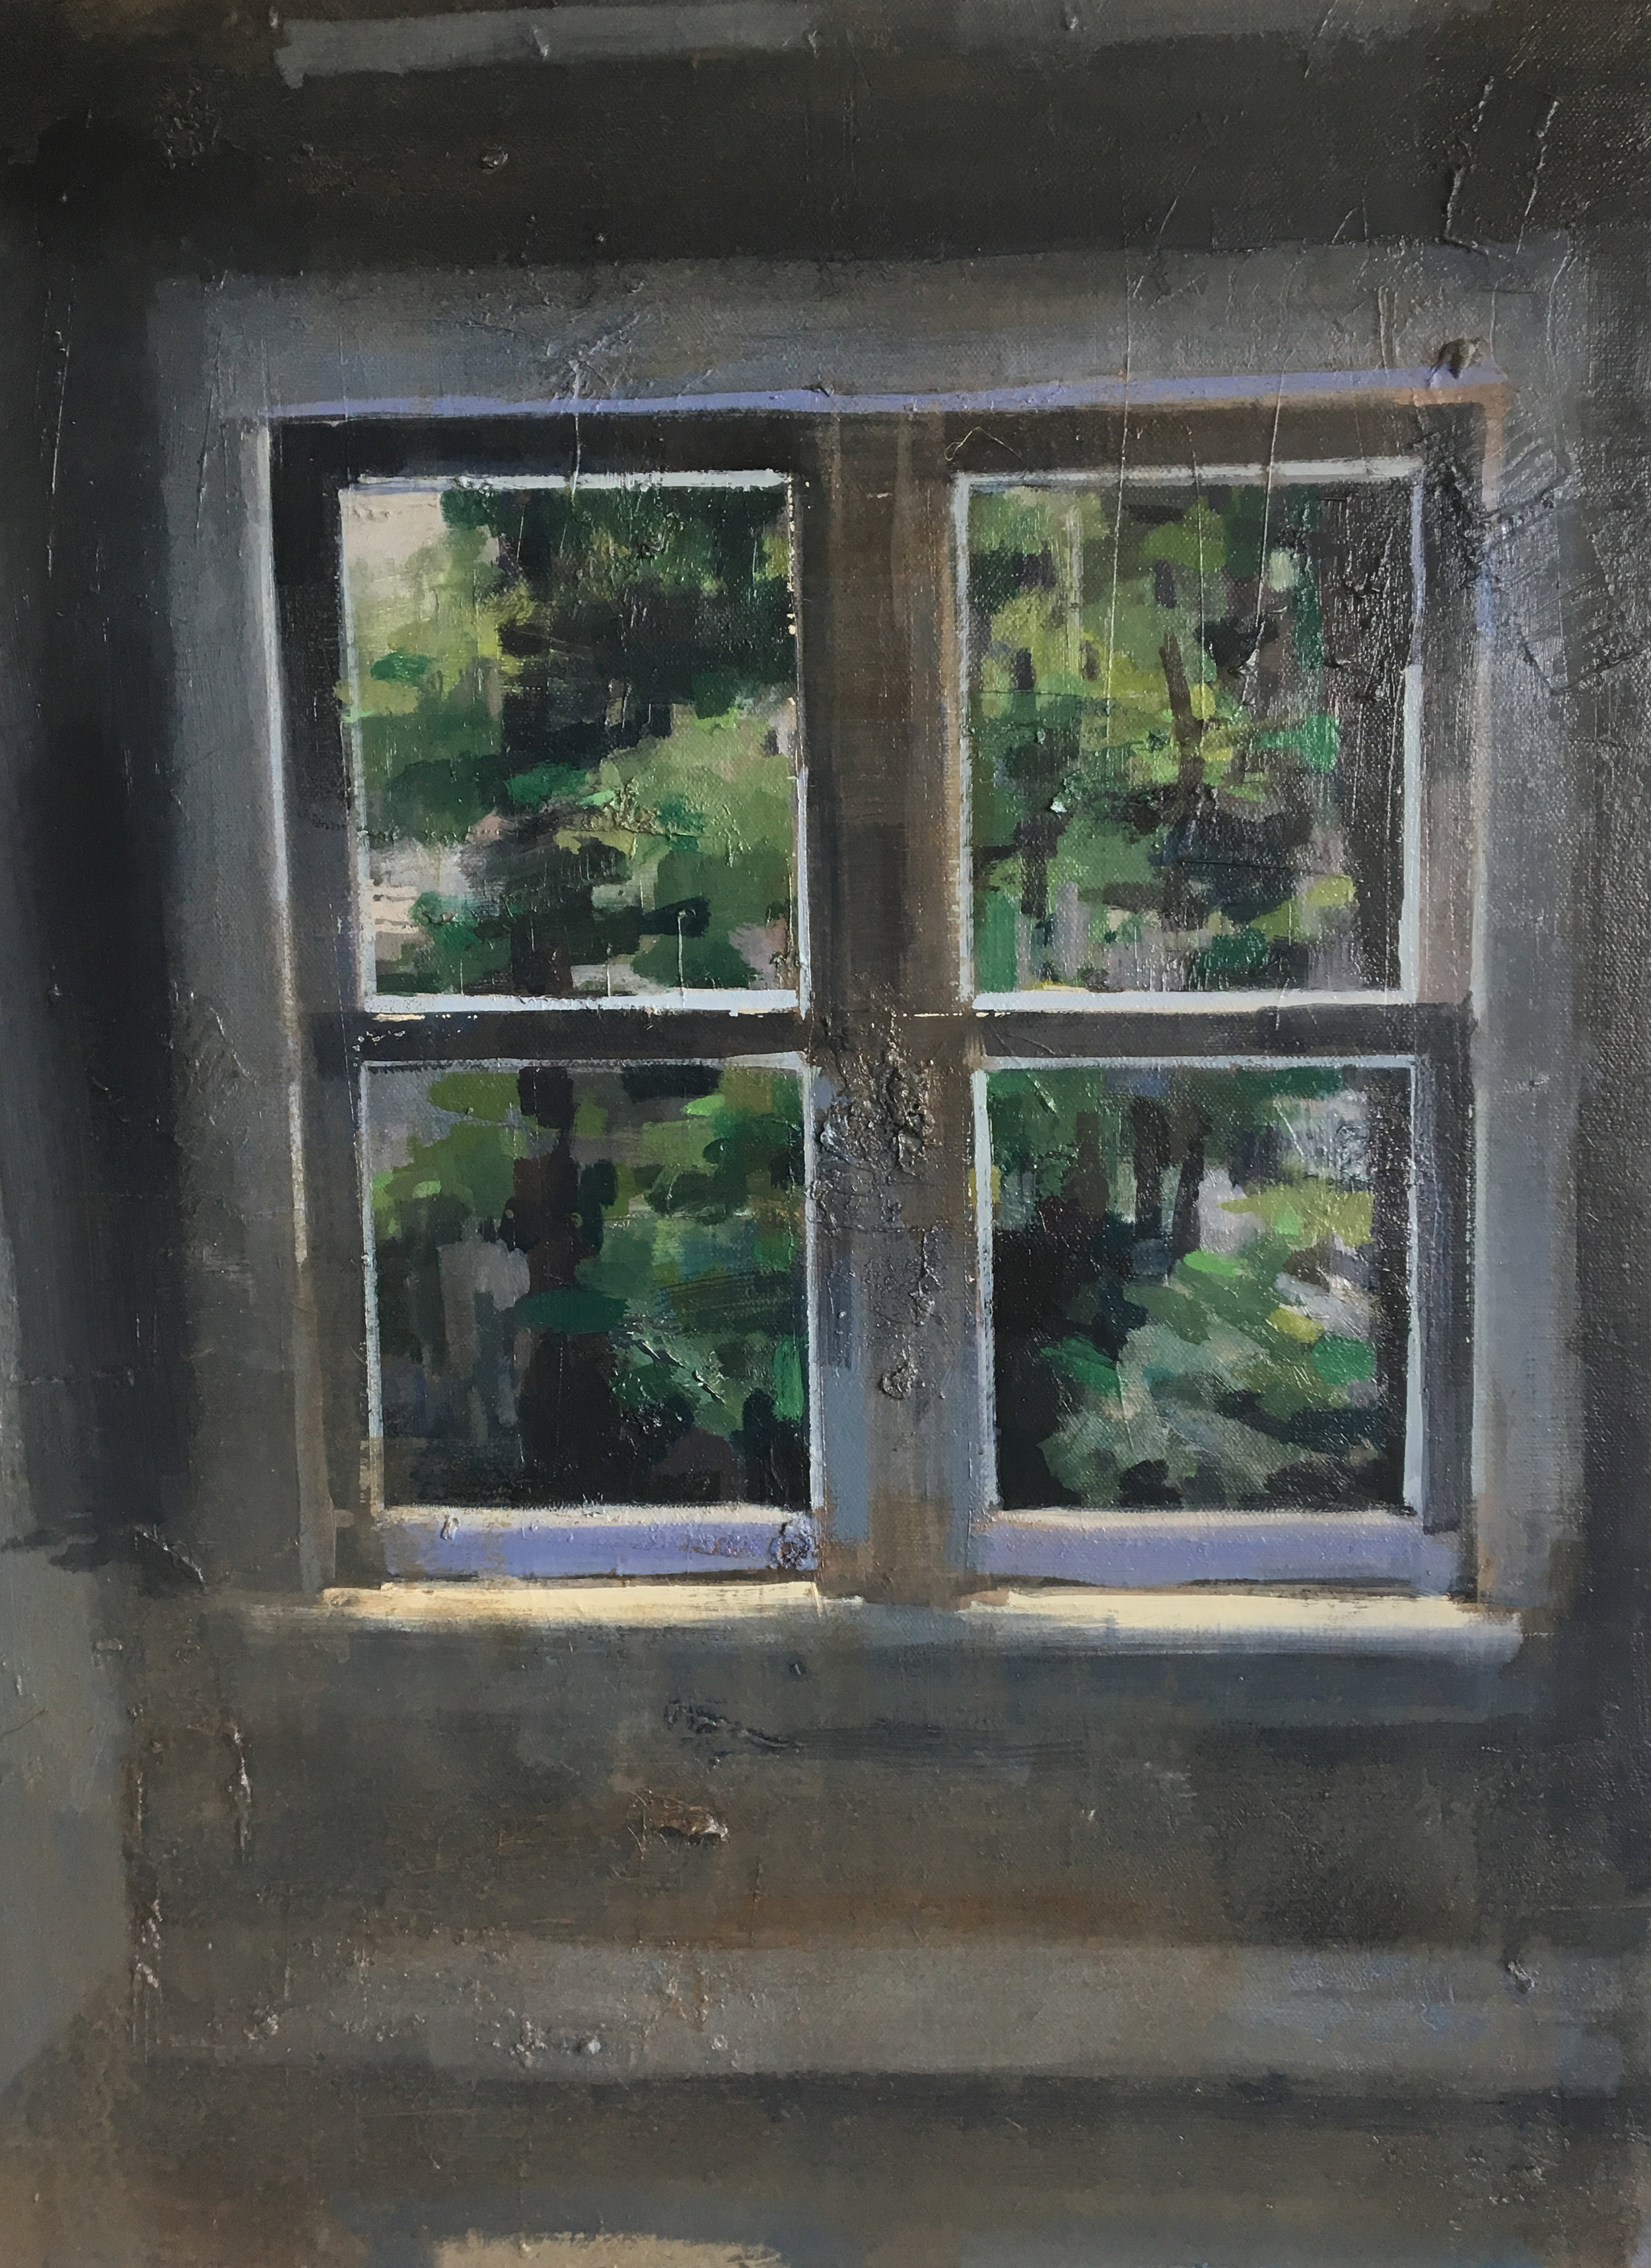 """Midsummer Sun in an Empty Room"" #4b, oil on canvas, 18x24, 2016-2018,  available"